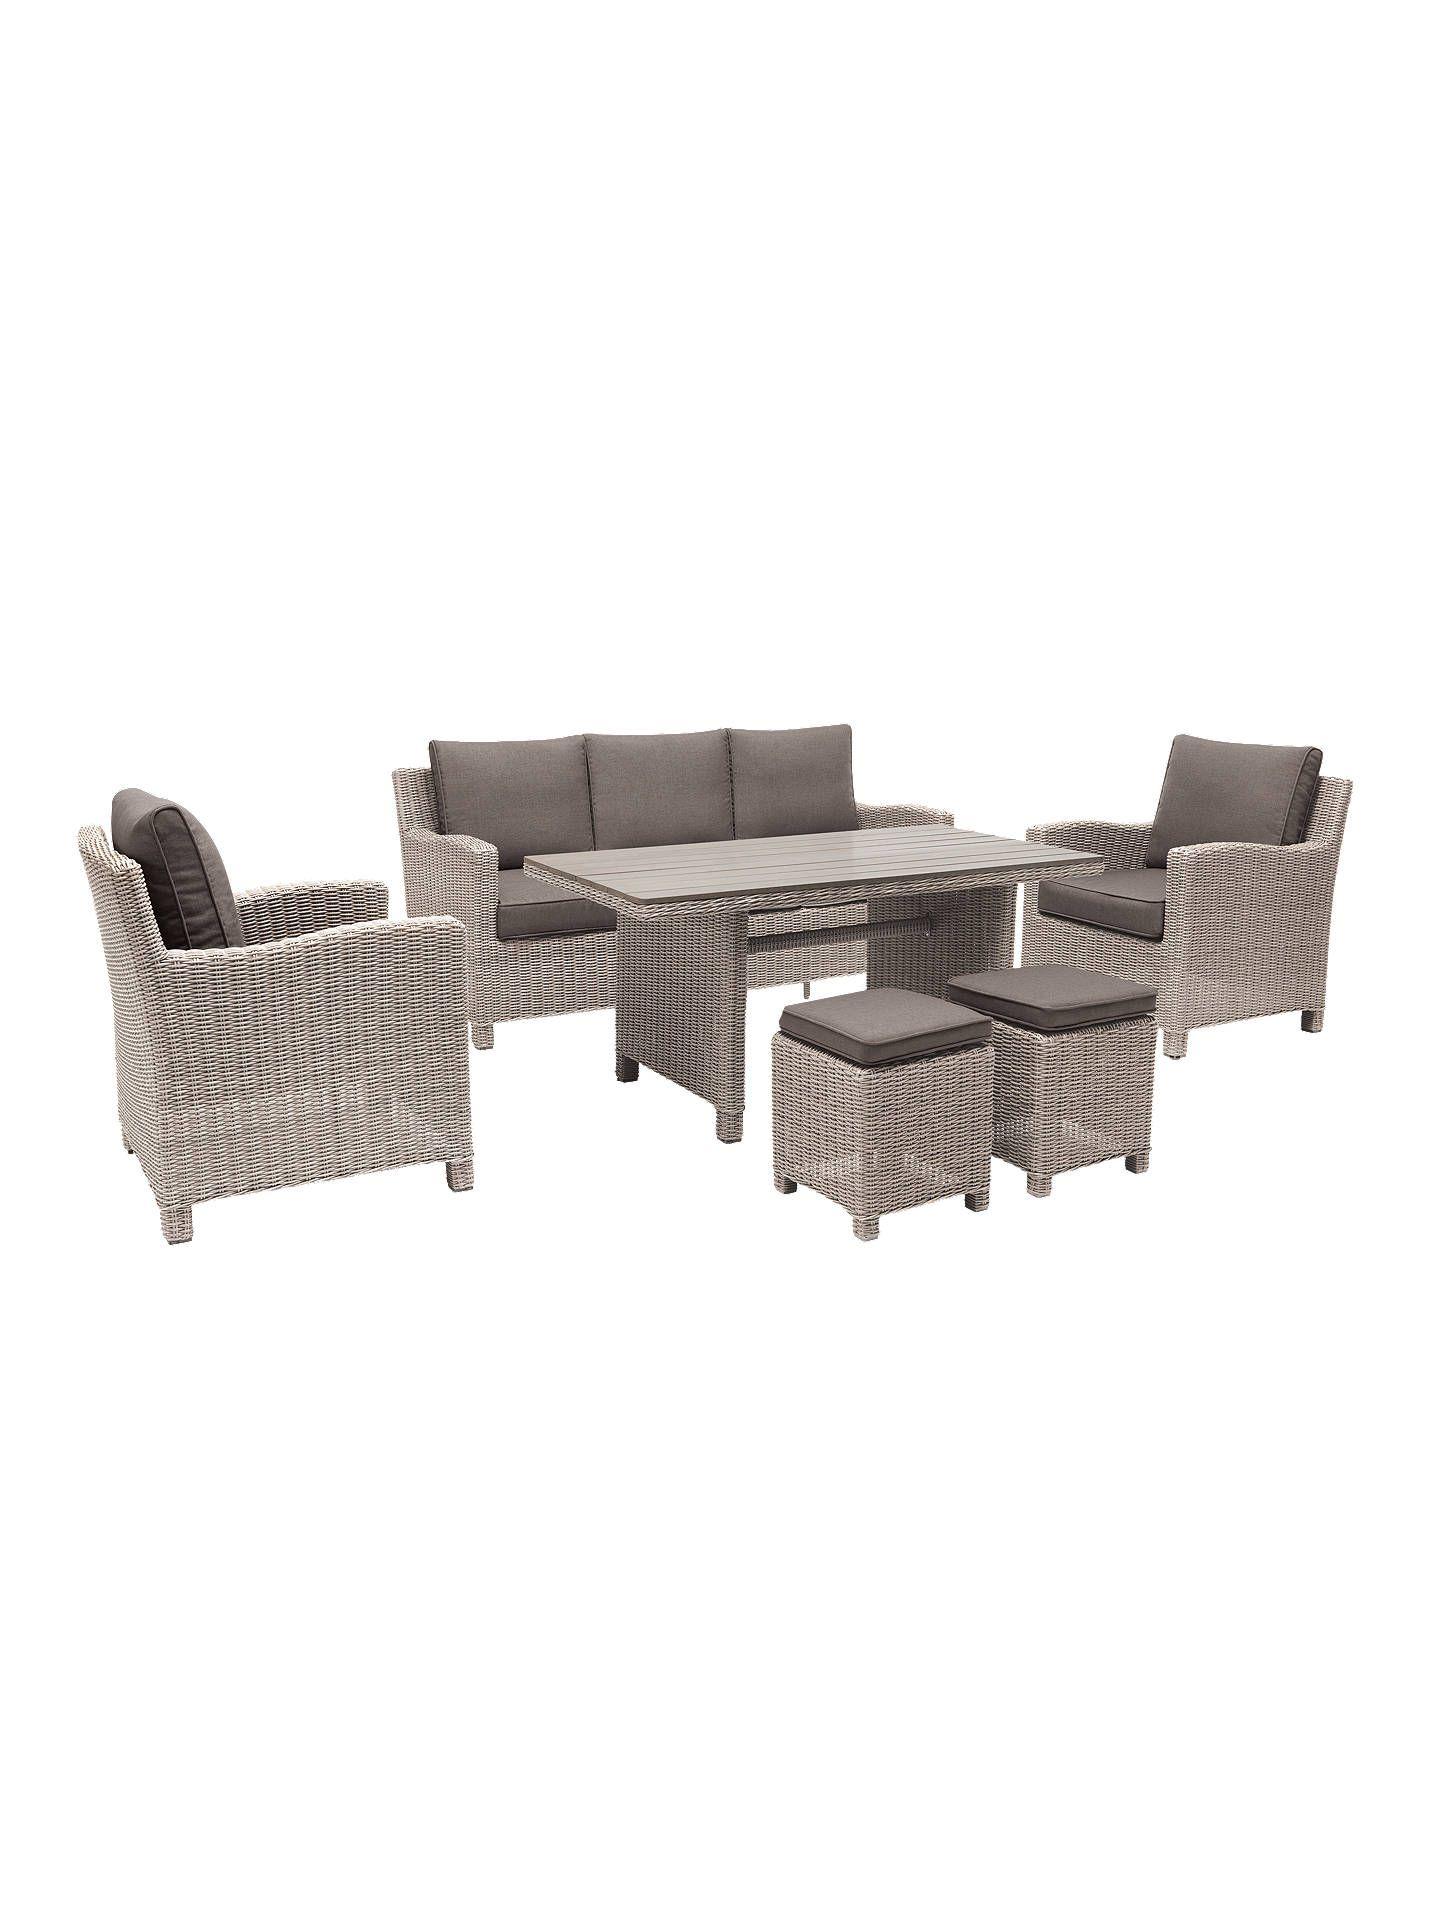 Kettler Palma 7 Seater Garden Lounging Set Rattan Garden Furniture Sets Casual Dining Table Seater